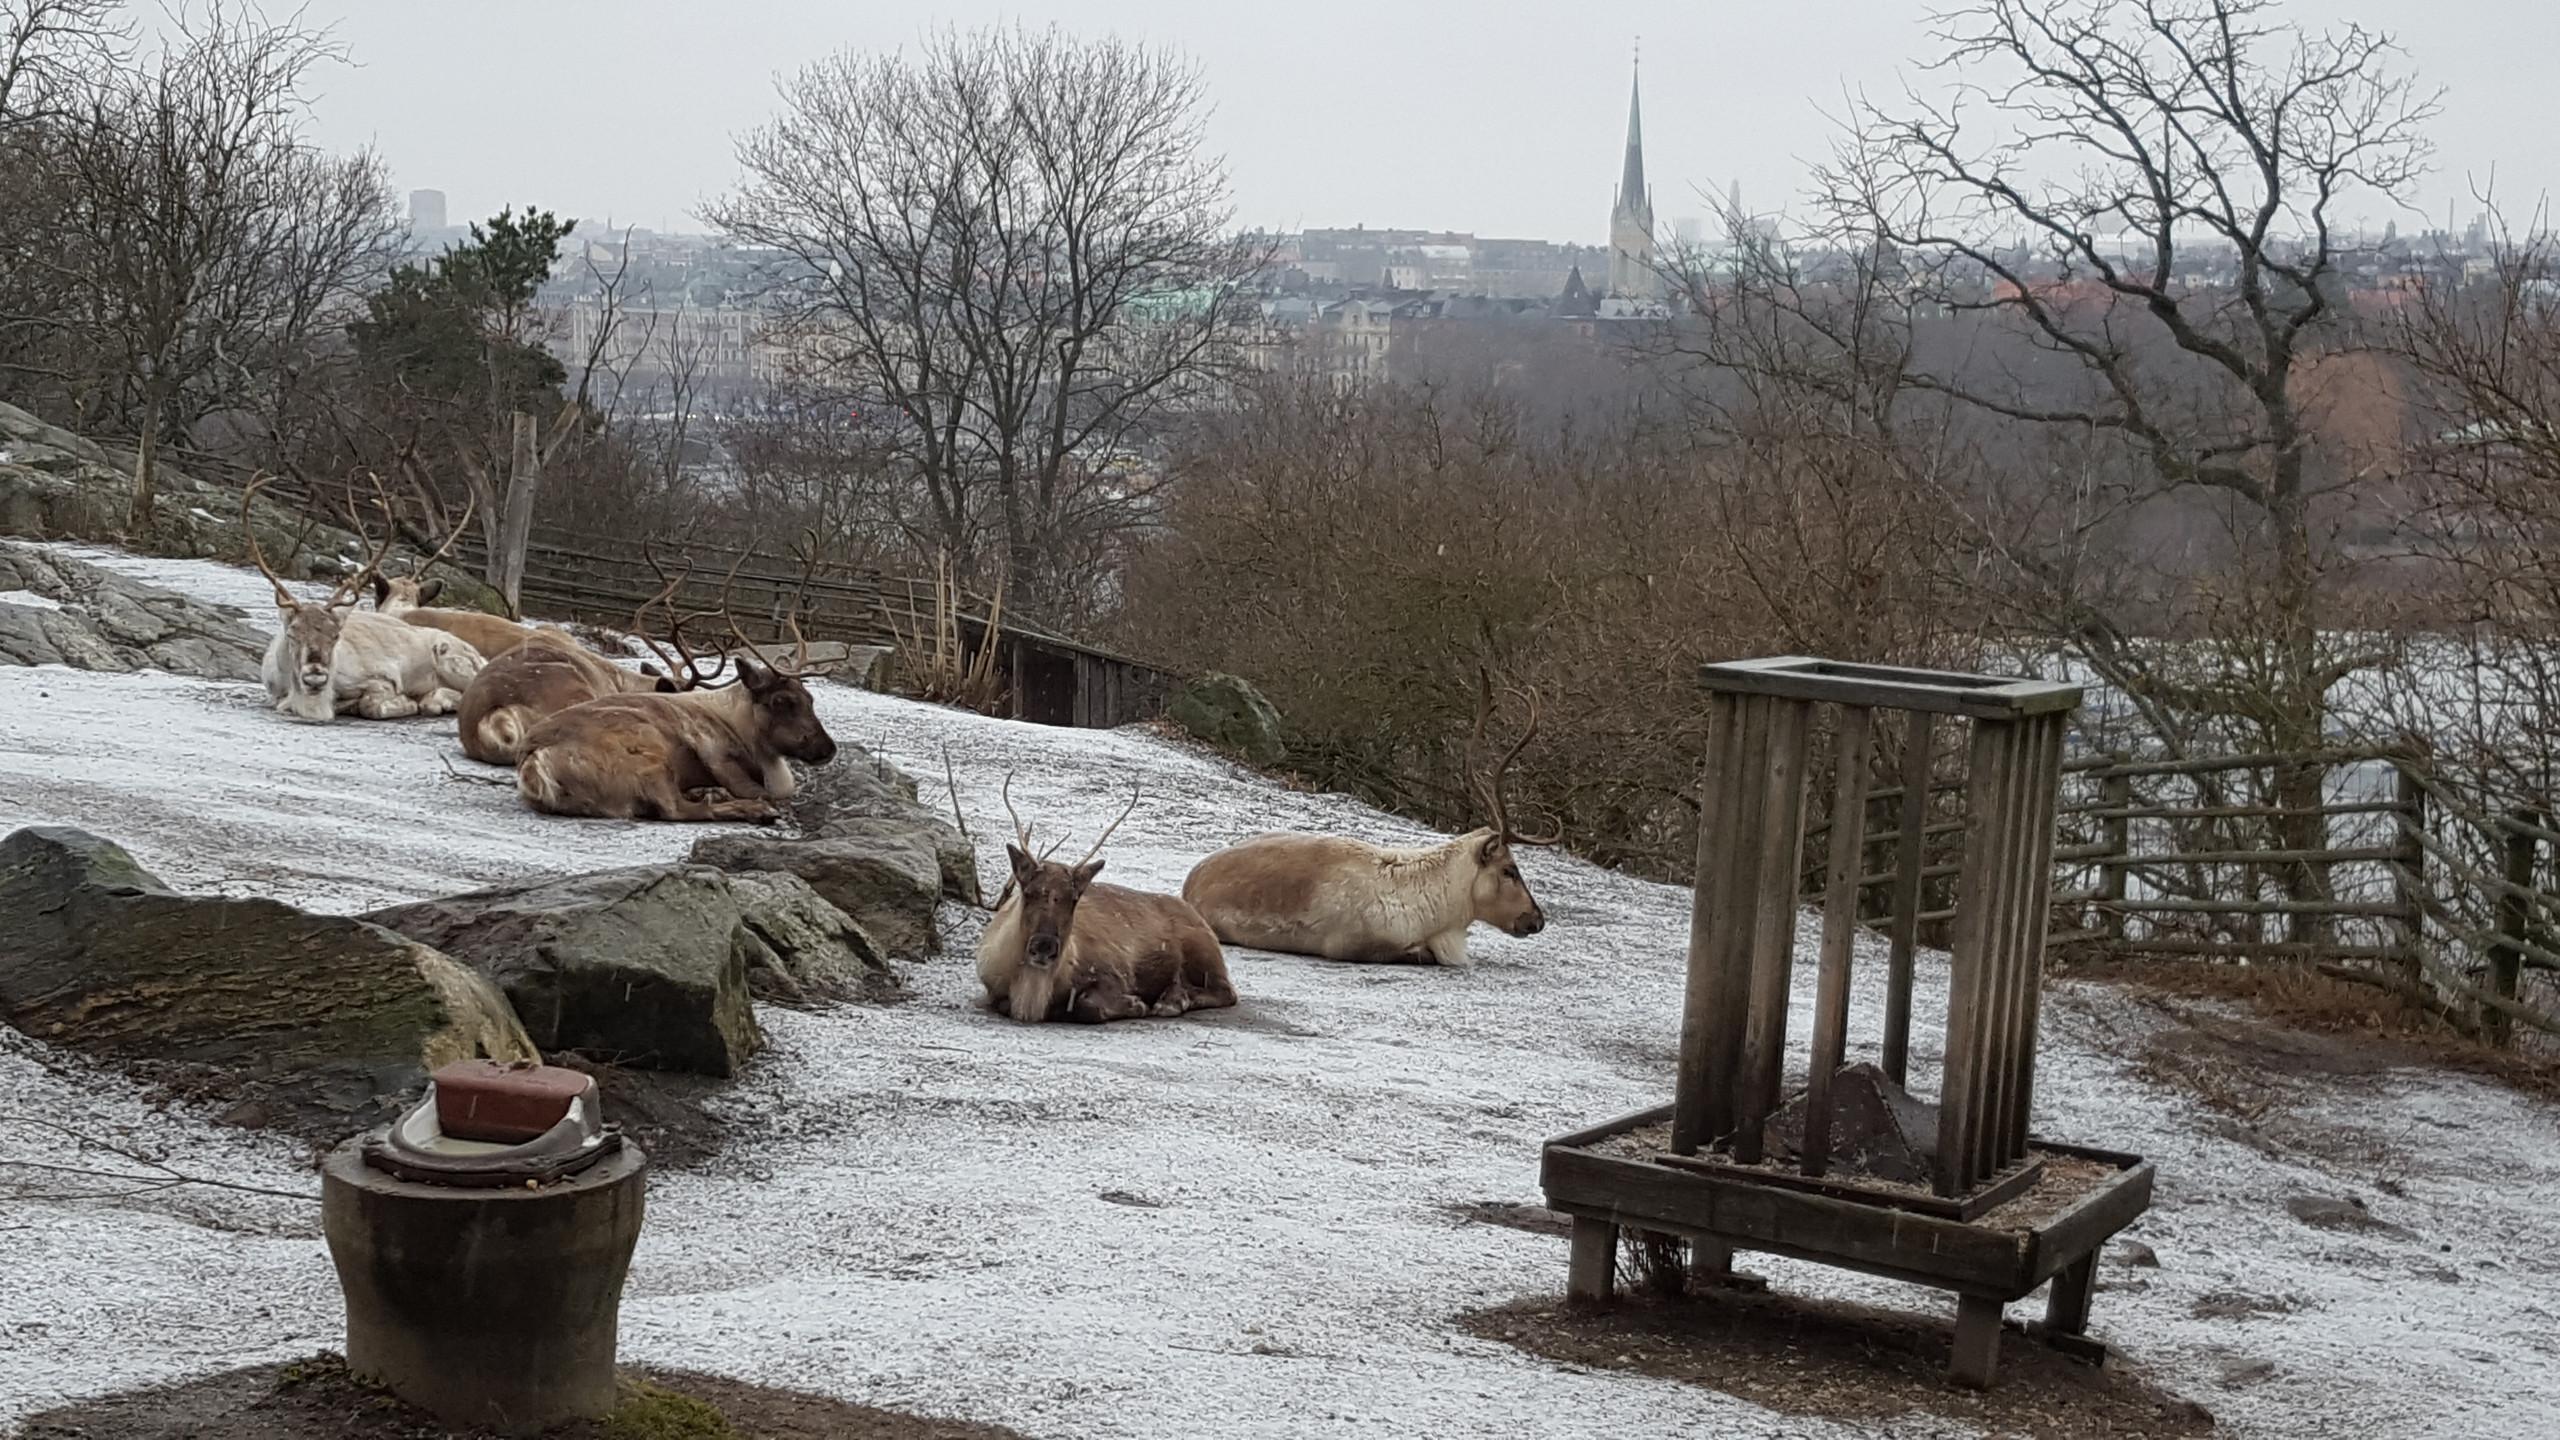 Skansen Museum and Zoo